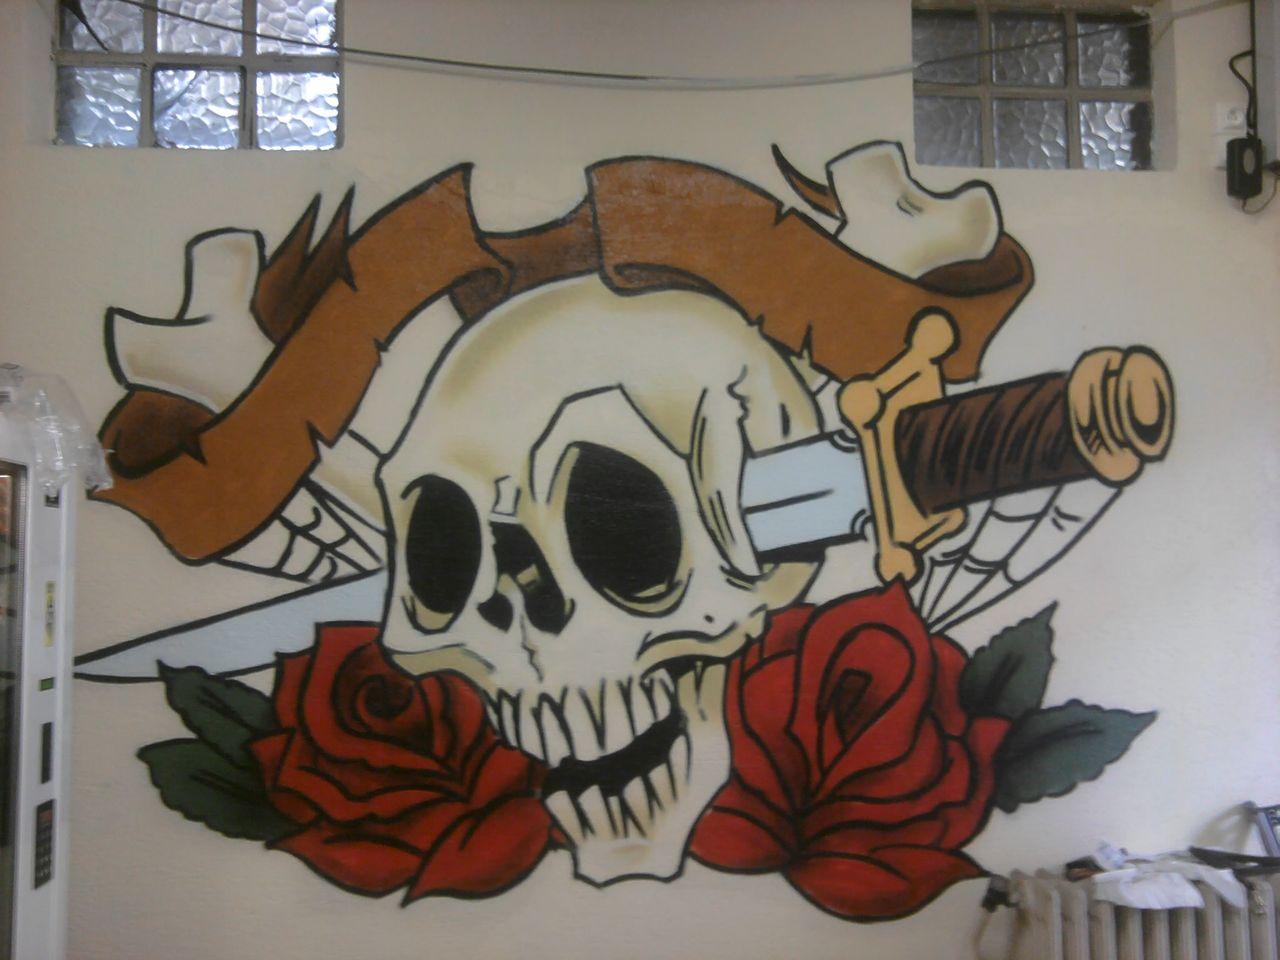 stiankr oner Skull Tattoo style